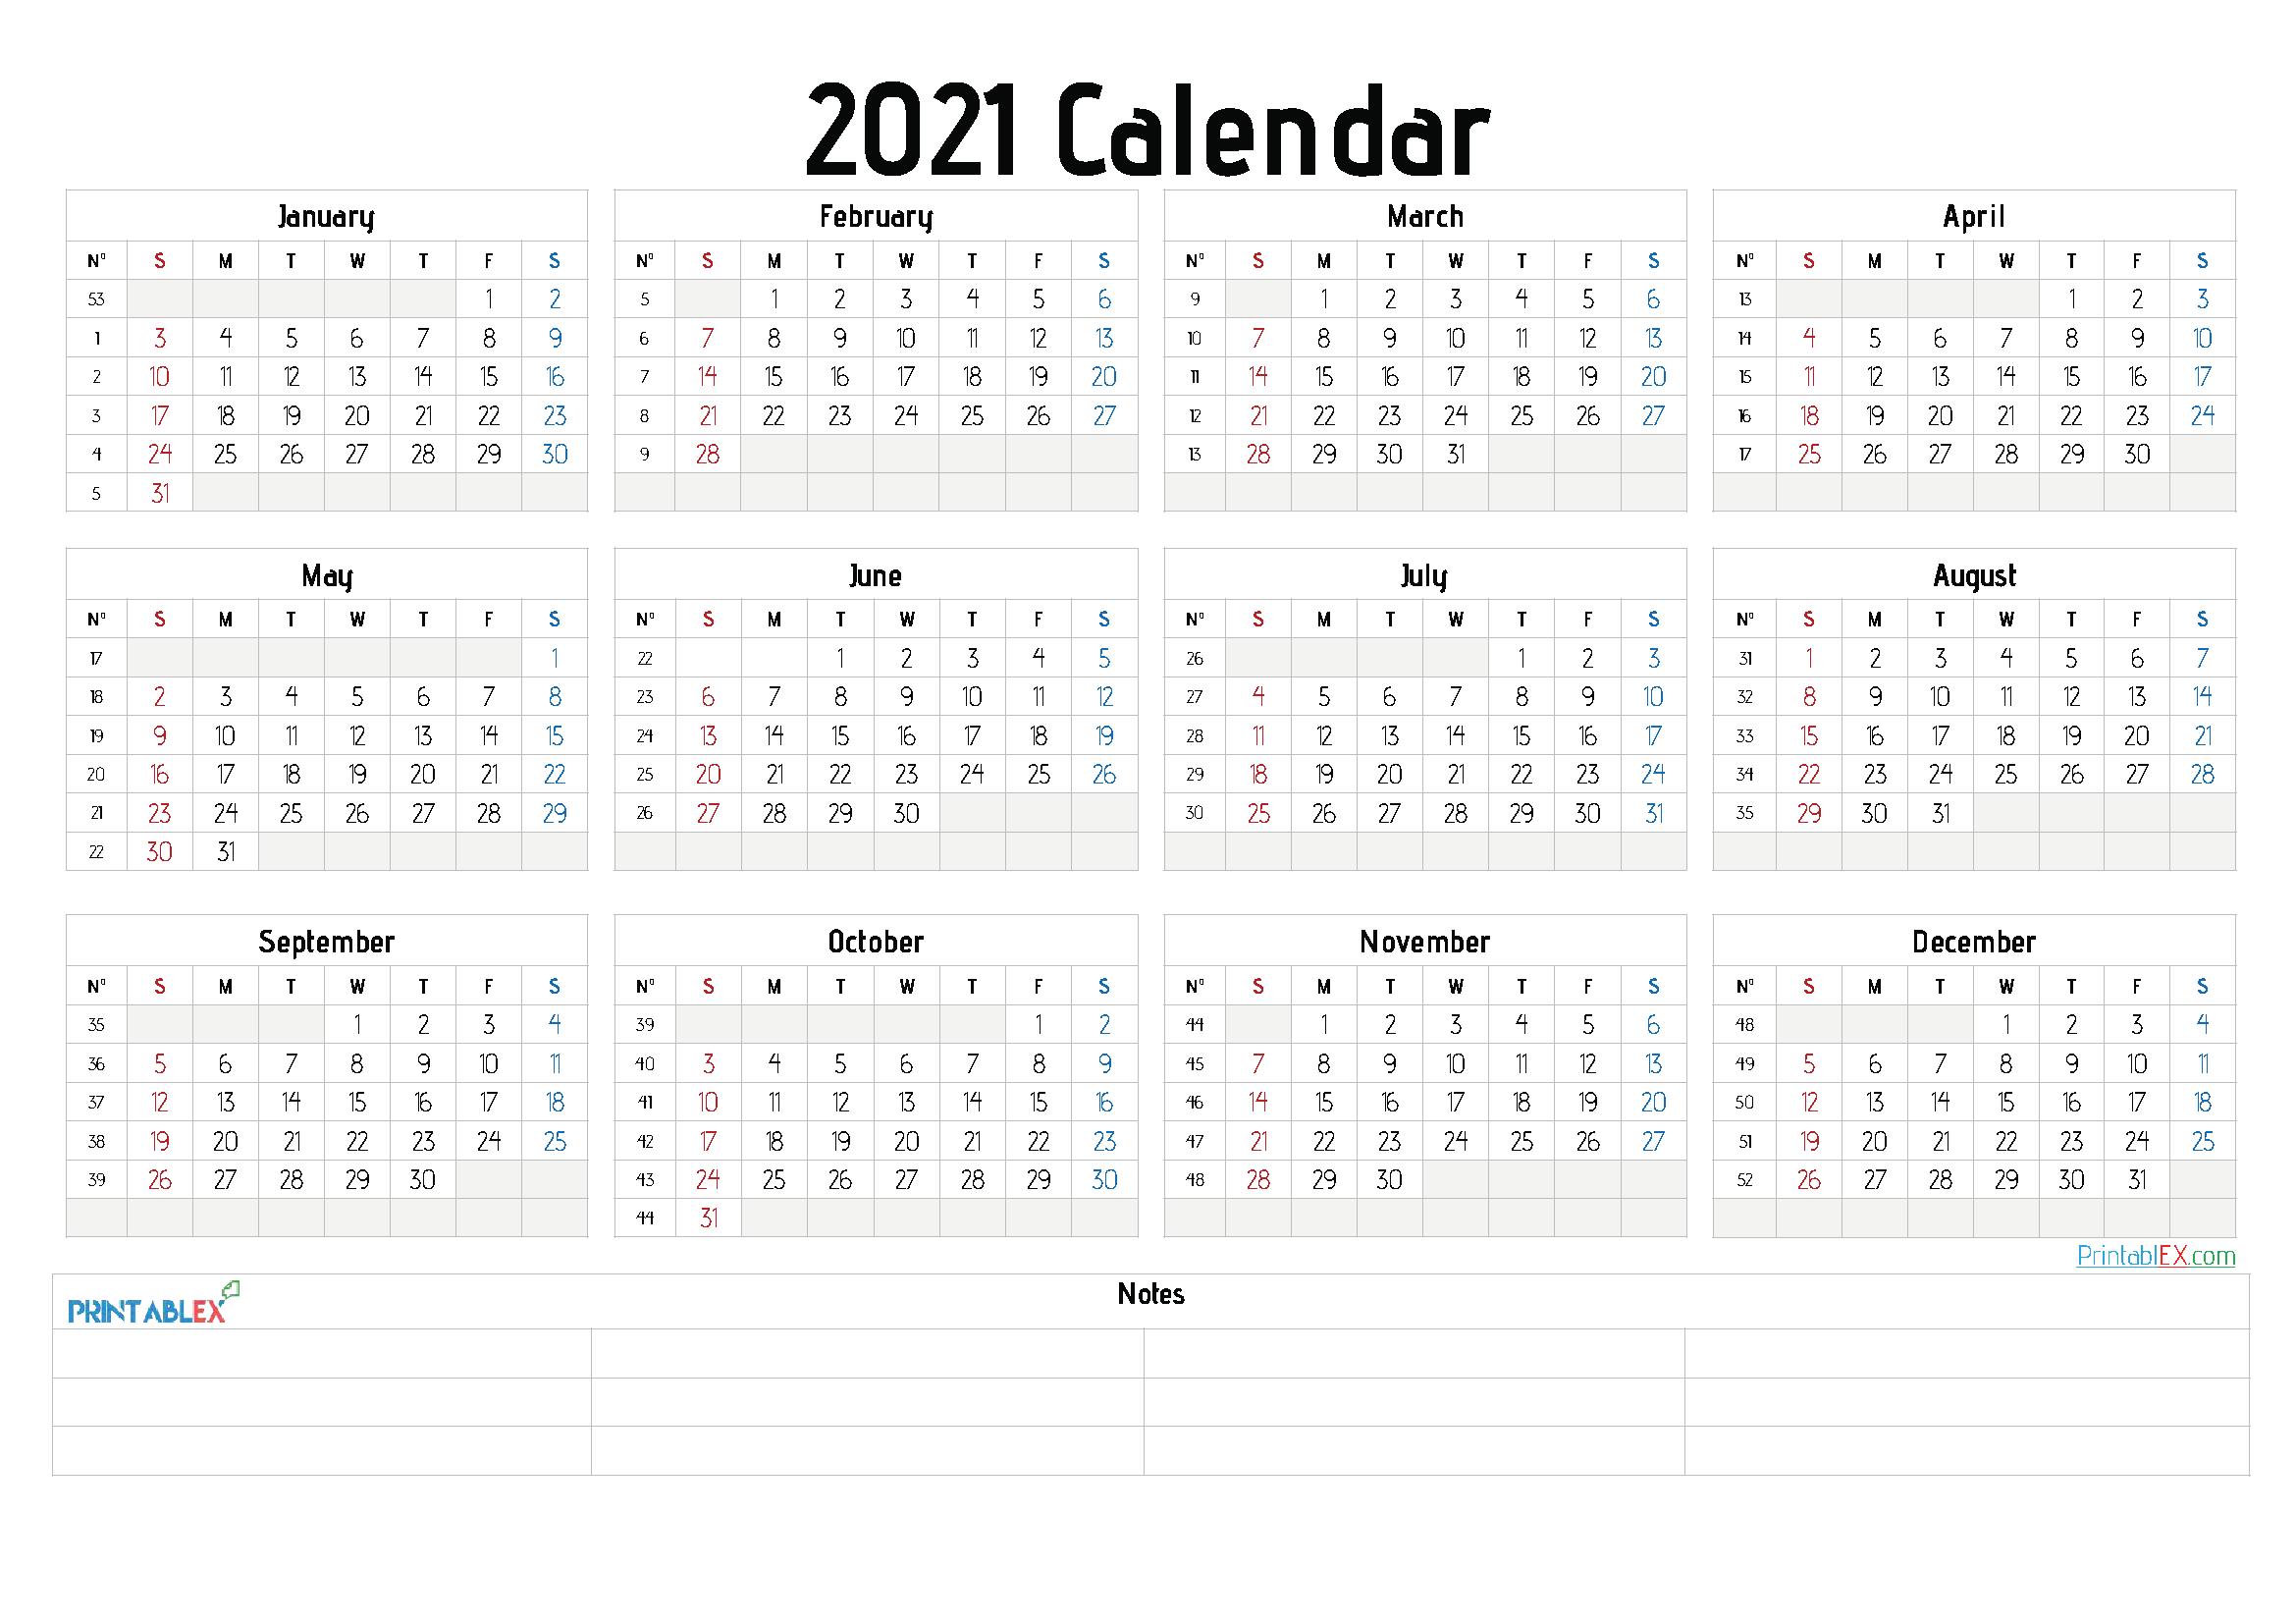 2021 Calendar Editable Free : Free 2021 Printable Calendar